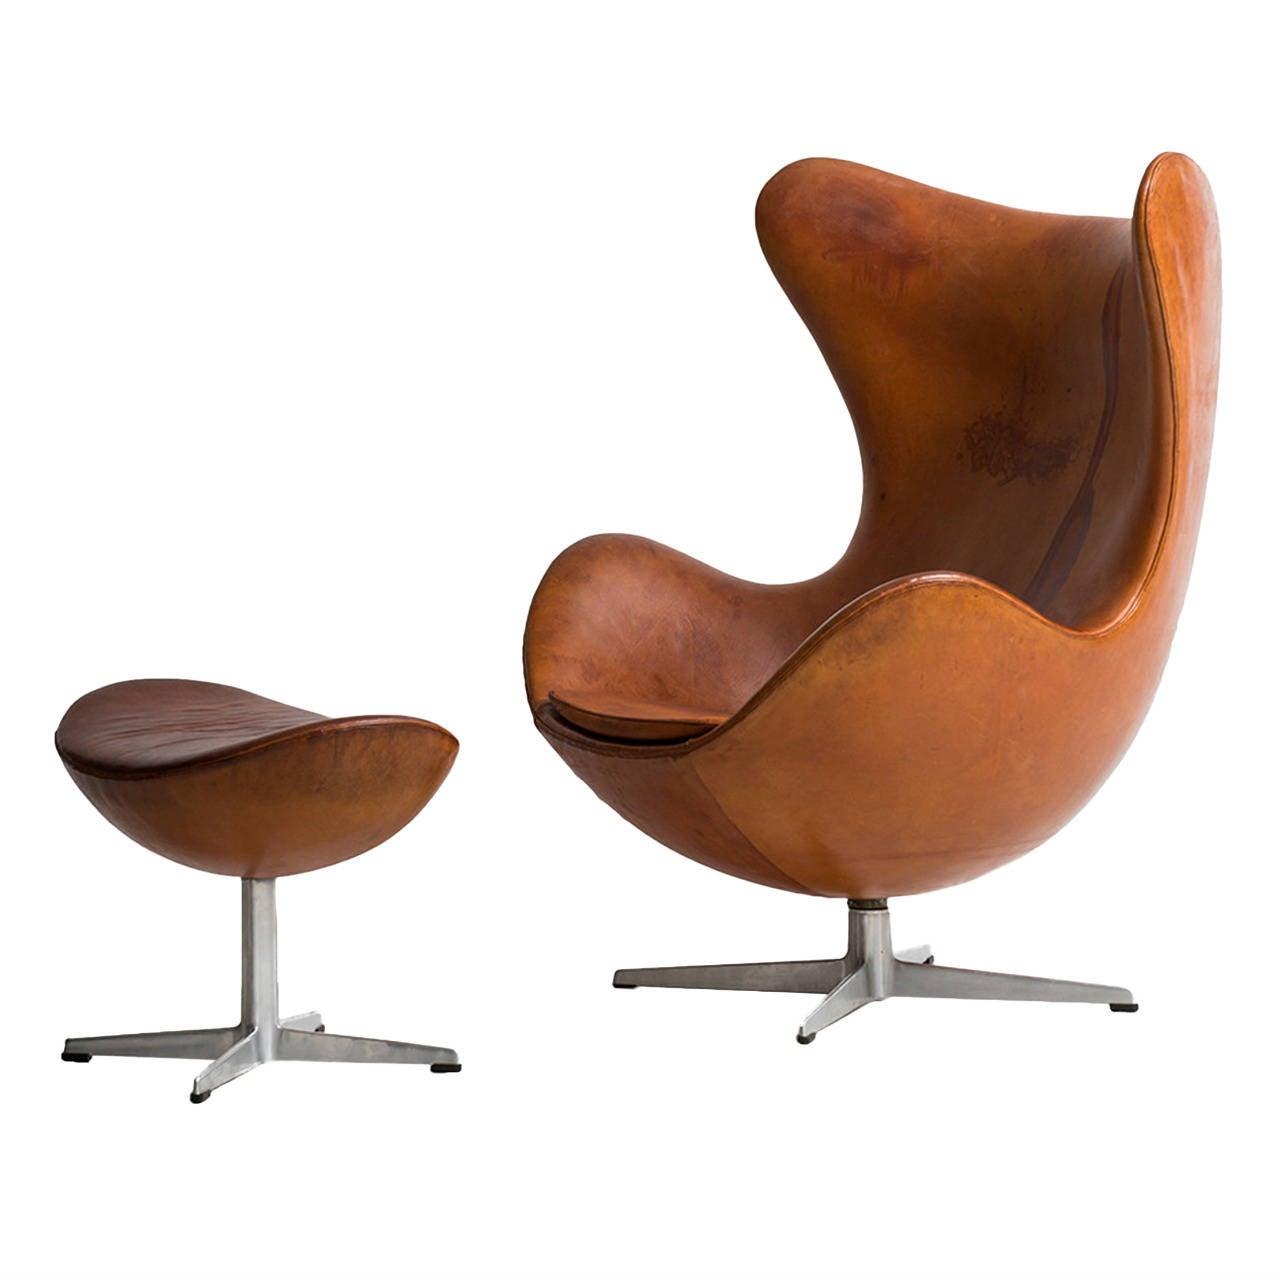 arne jacobsen egg chair in original cognac brown leather by fritz hansen at 1stdibs. Black Bedroom Furniture Sets. Home Design Ideas